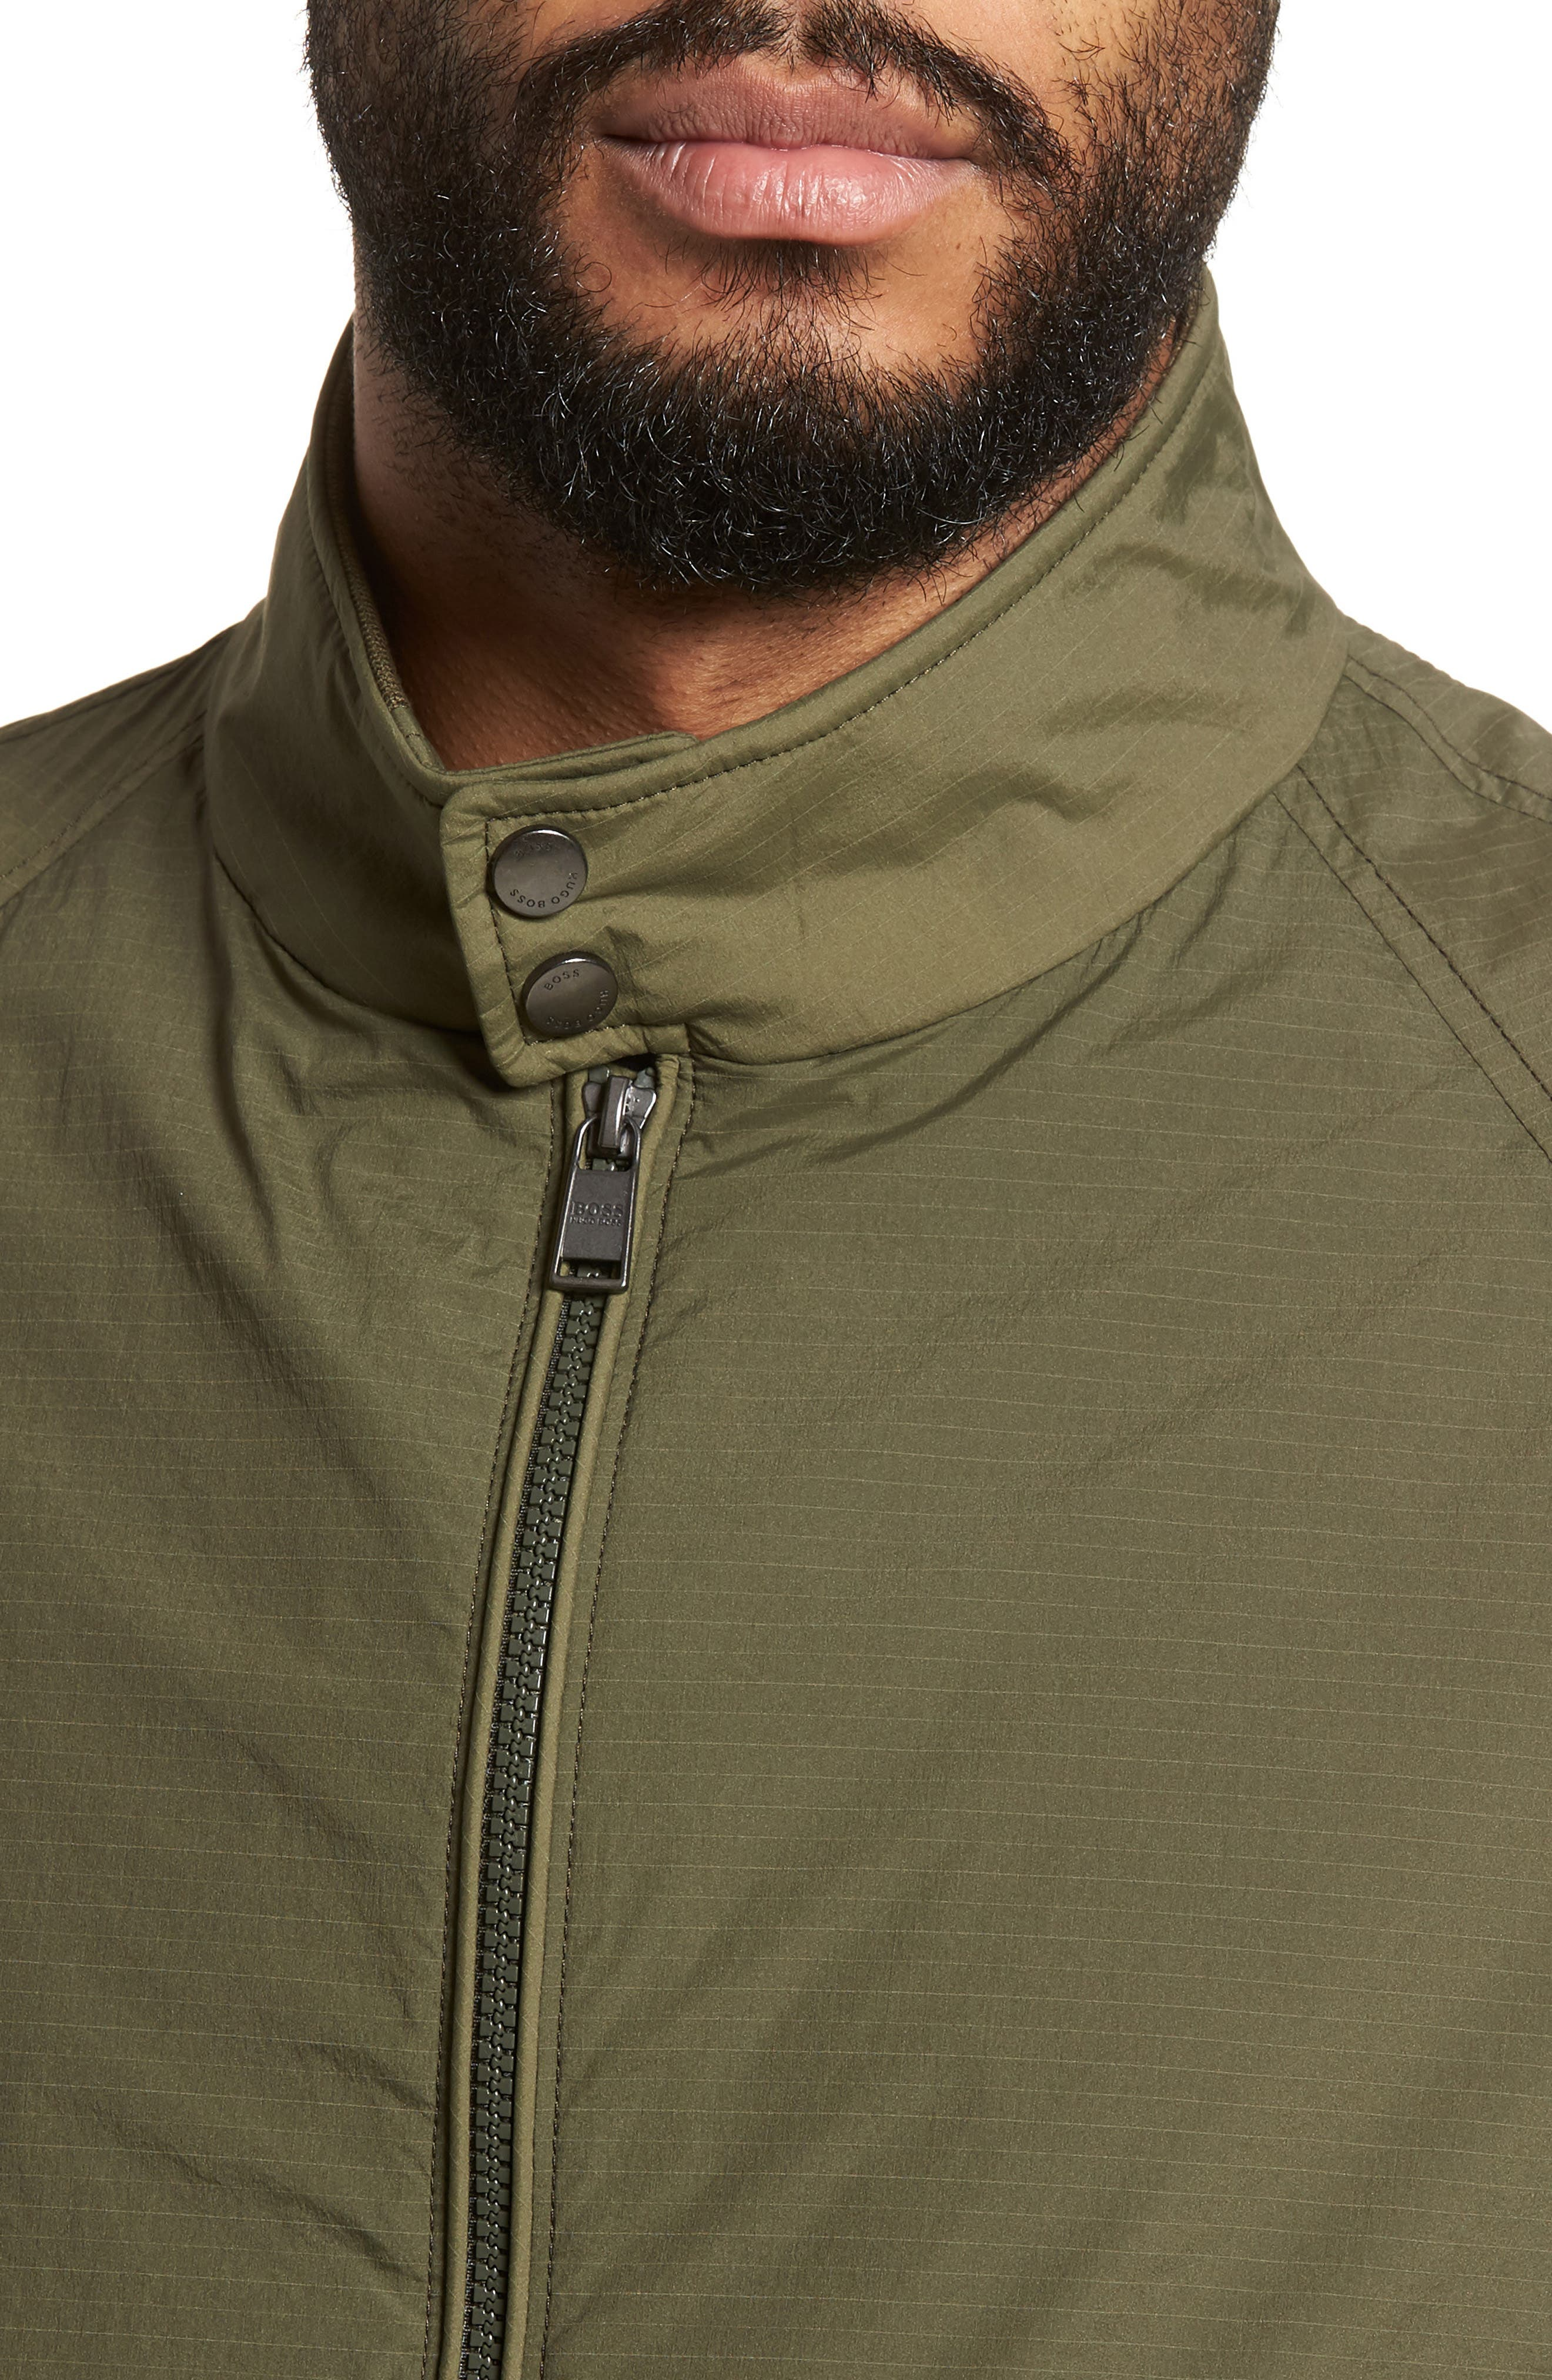 Camdan Ripstop Jacket,                             Alternate thumbnail 4, color,                             359